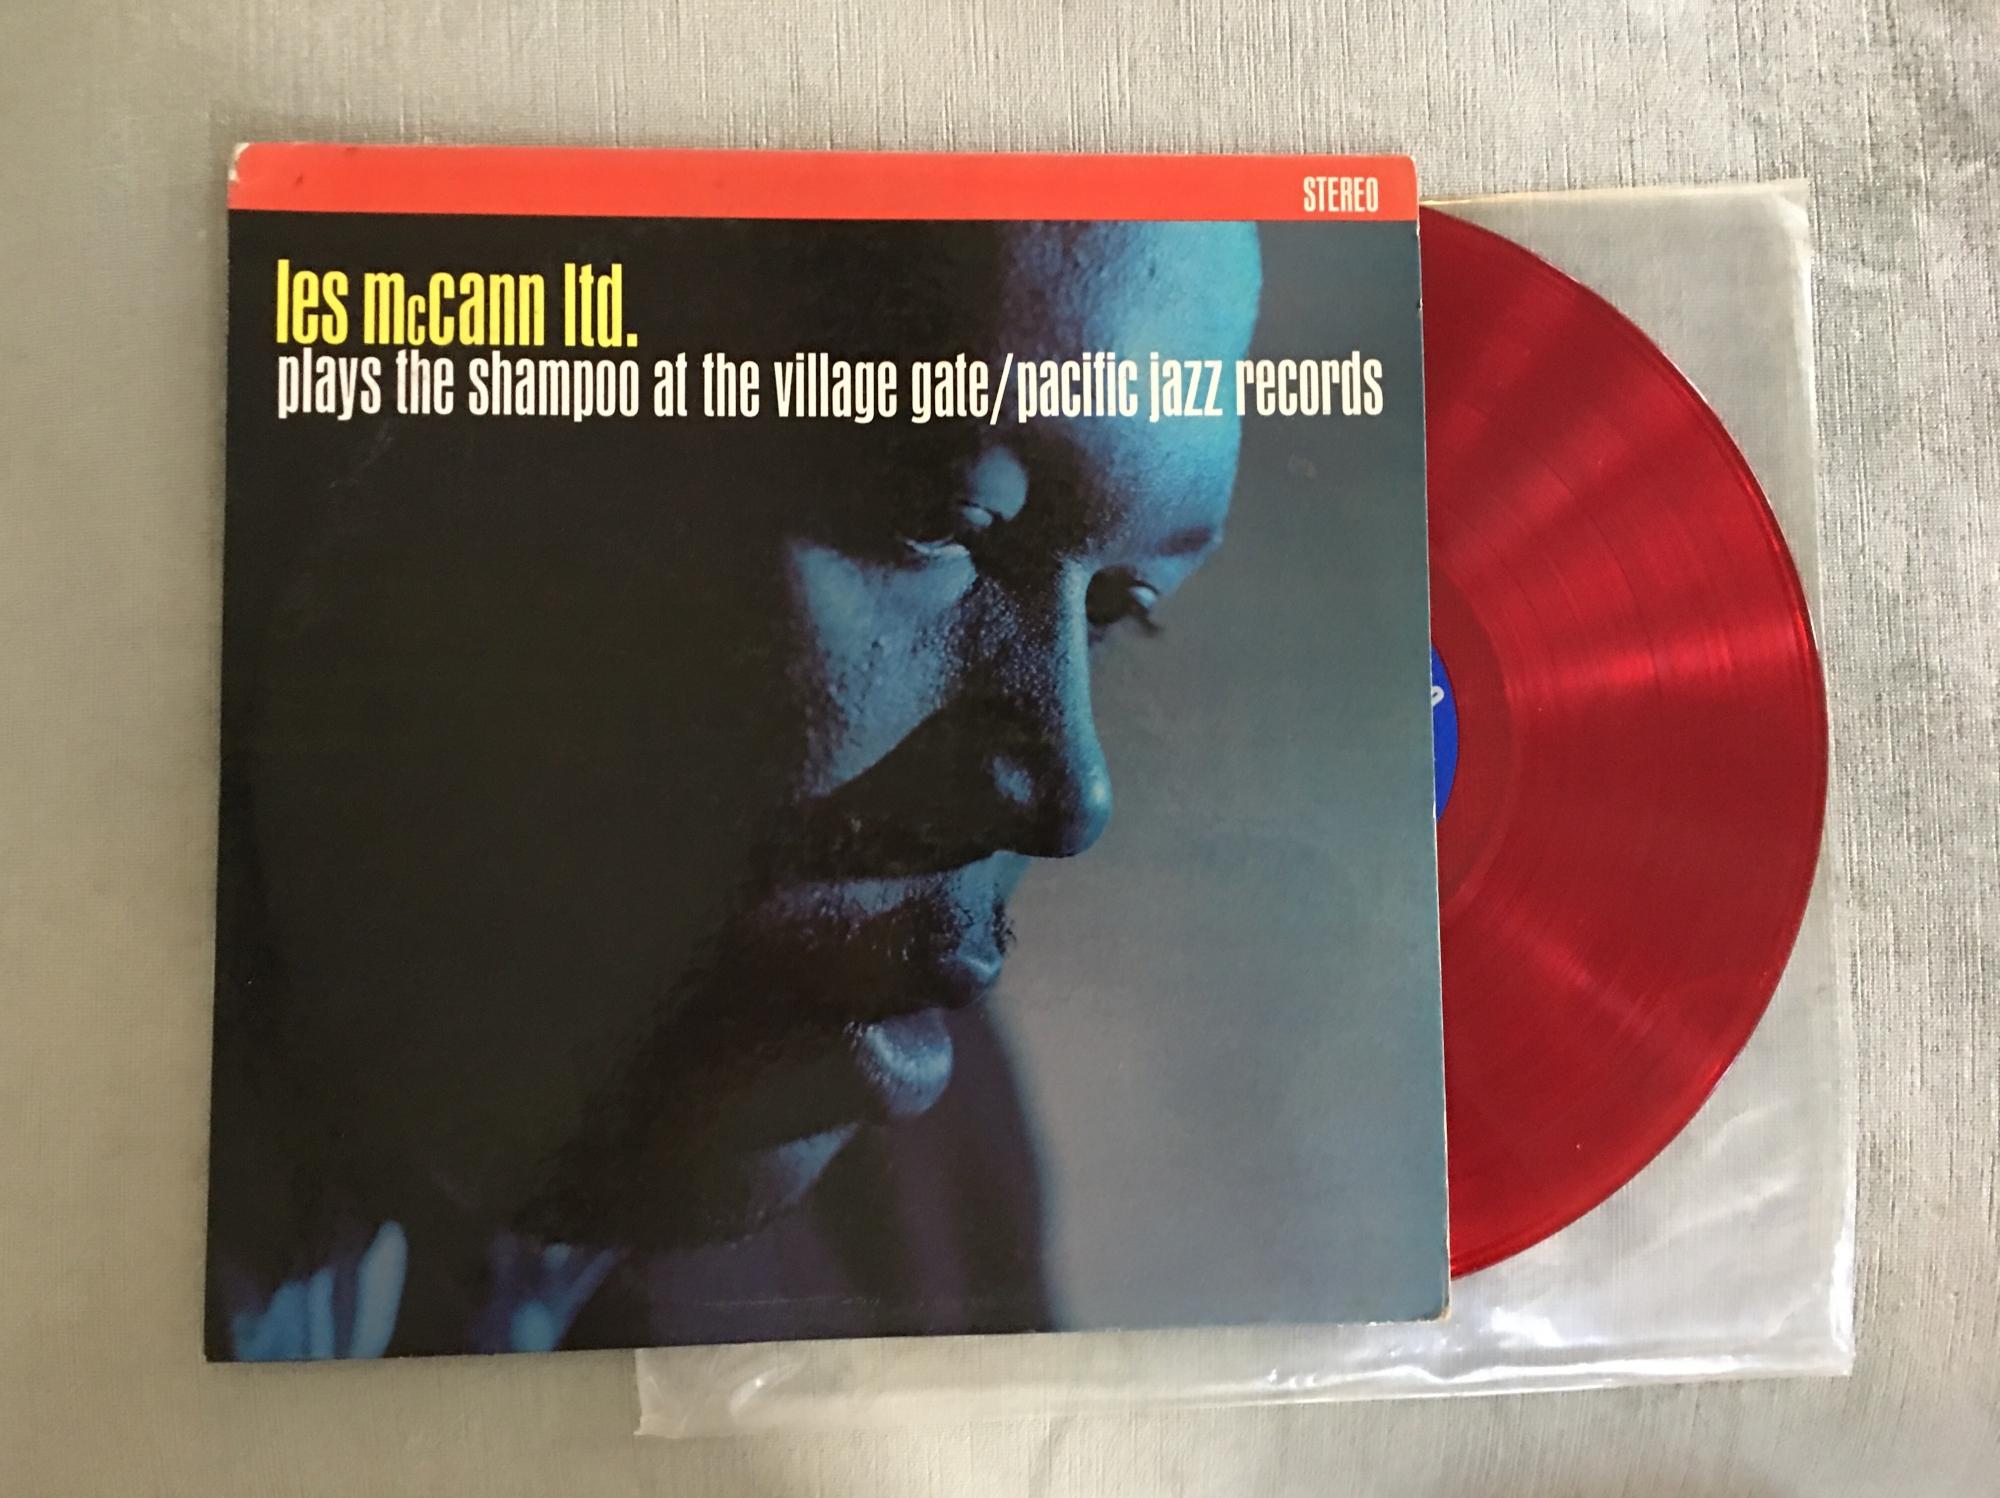 Les McCann Ltd. plays the Shampoo at the Village Gate red vinyl